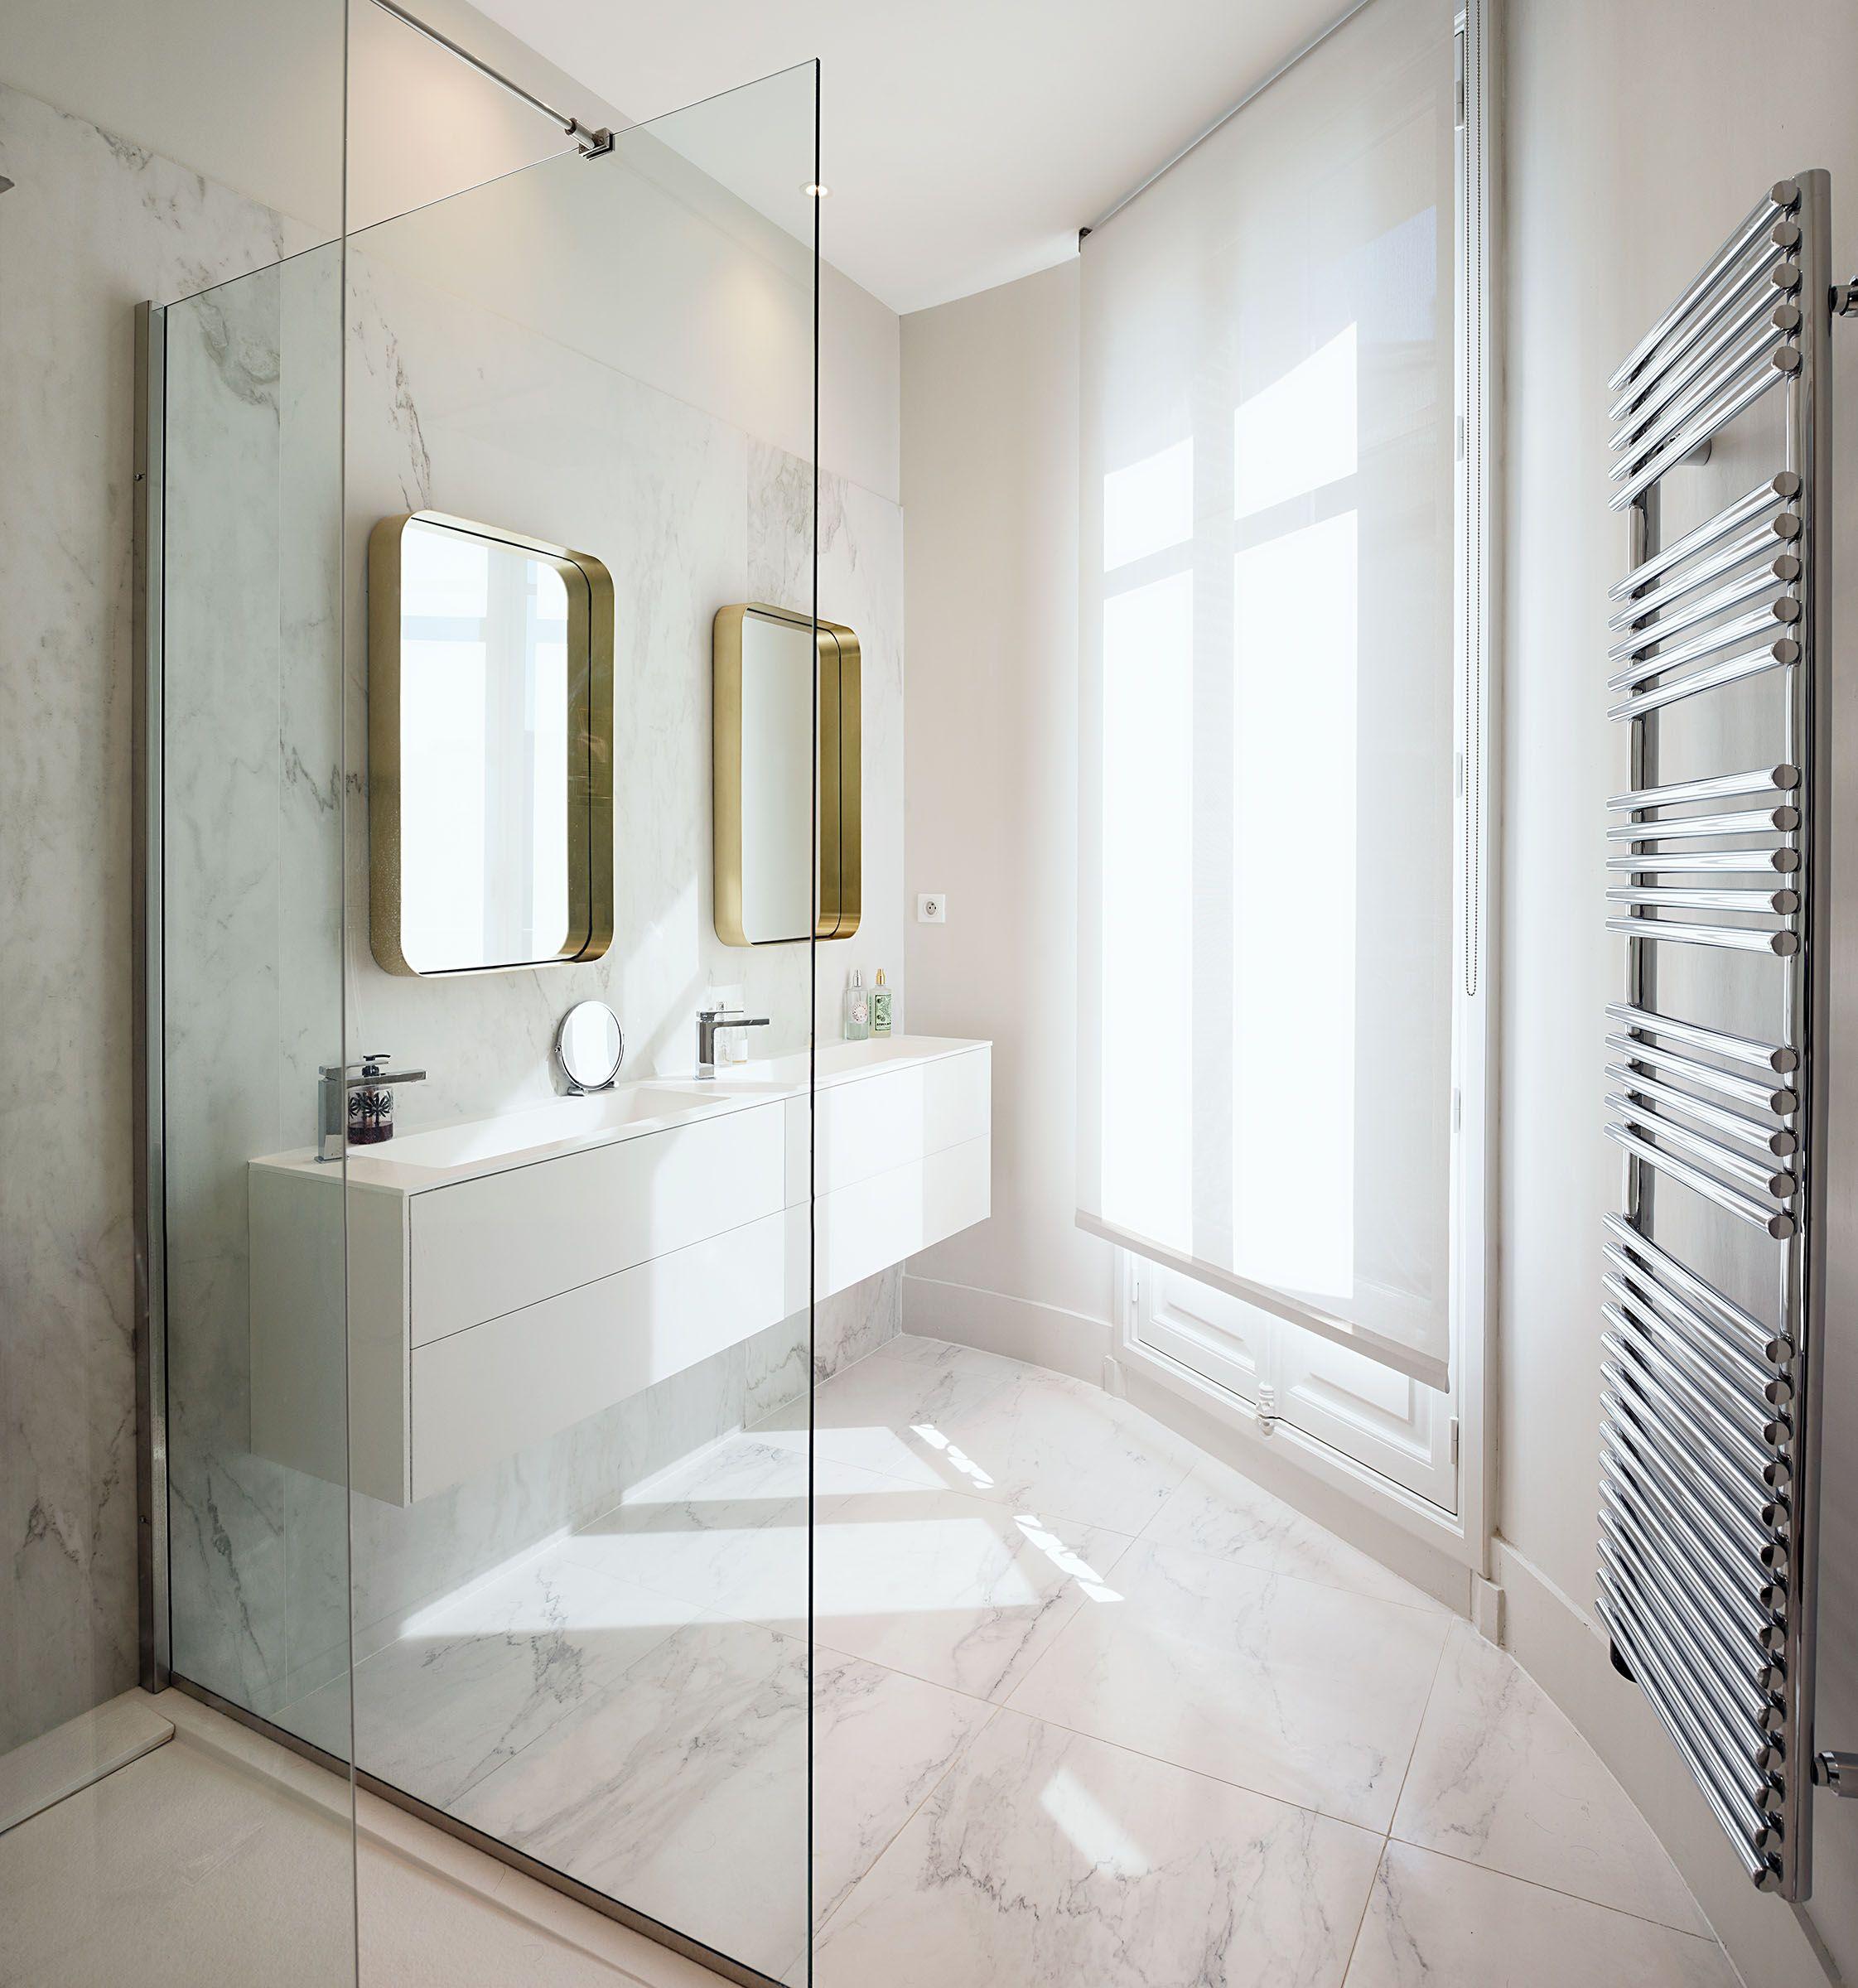 appartement paris 16 appartement r nov bathroom. Black Bedroom Furniture Sets. Home Design Ideas